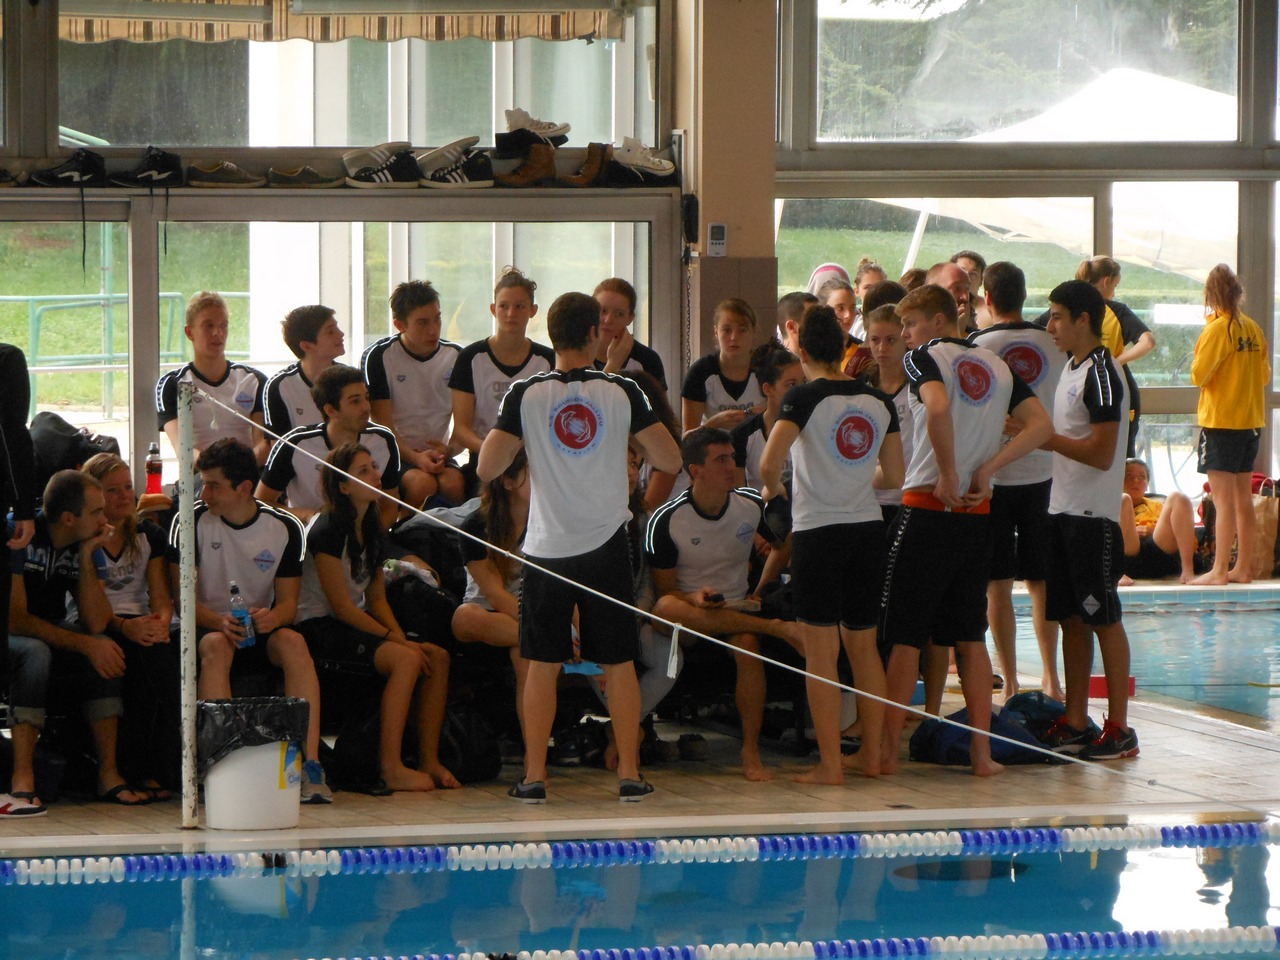 Interclubs fontaine 2013 csbj natation for Piscine bourgoin jallieu